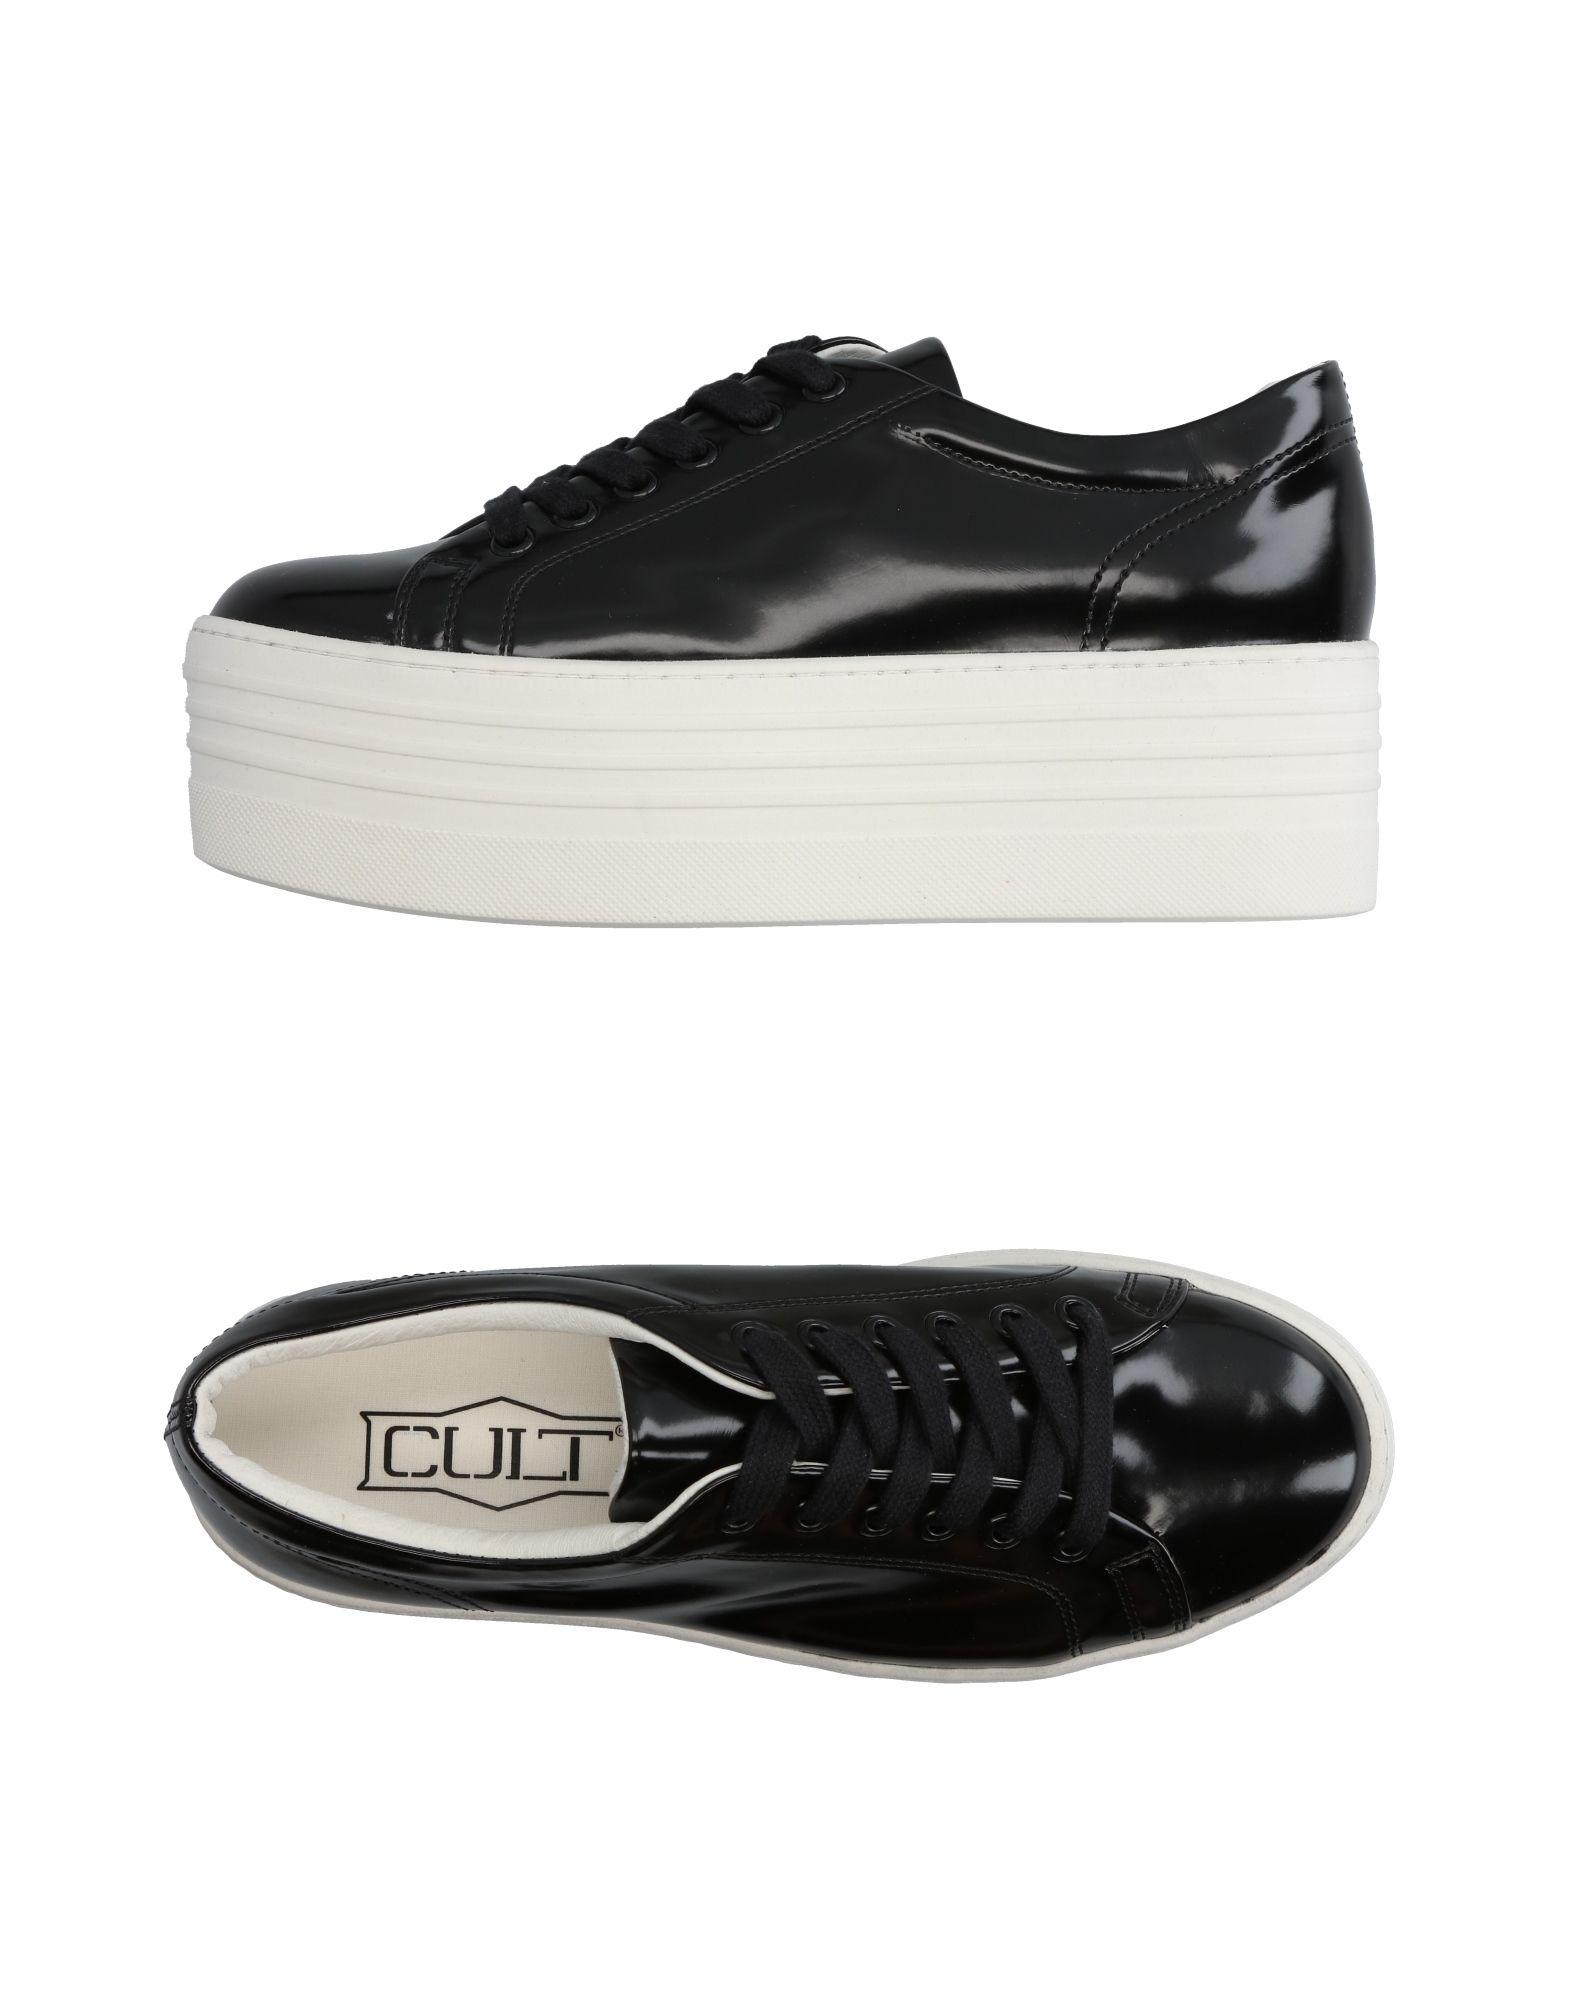 CULT - Yoox - Γυναικεία Αθλητικά Παπούτσια  d6e4c4a6e3f